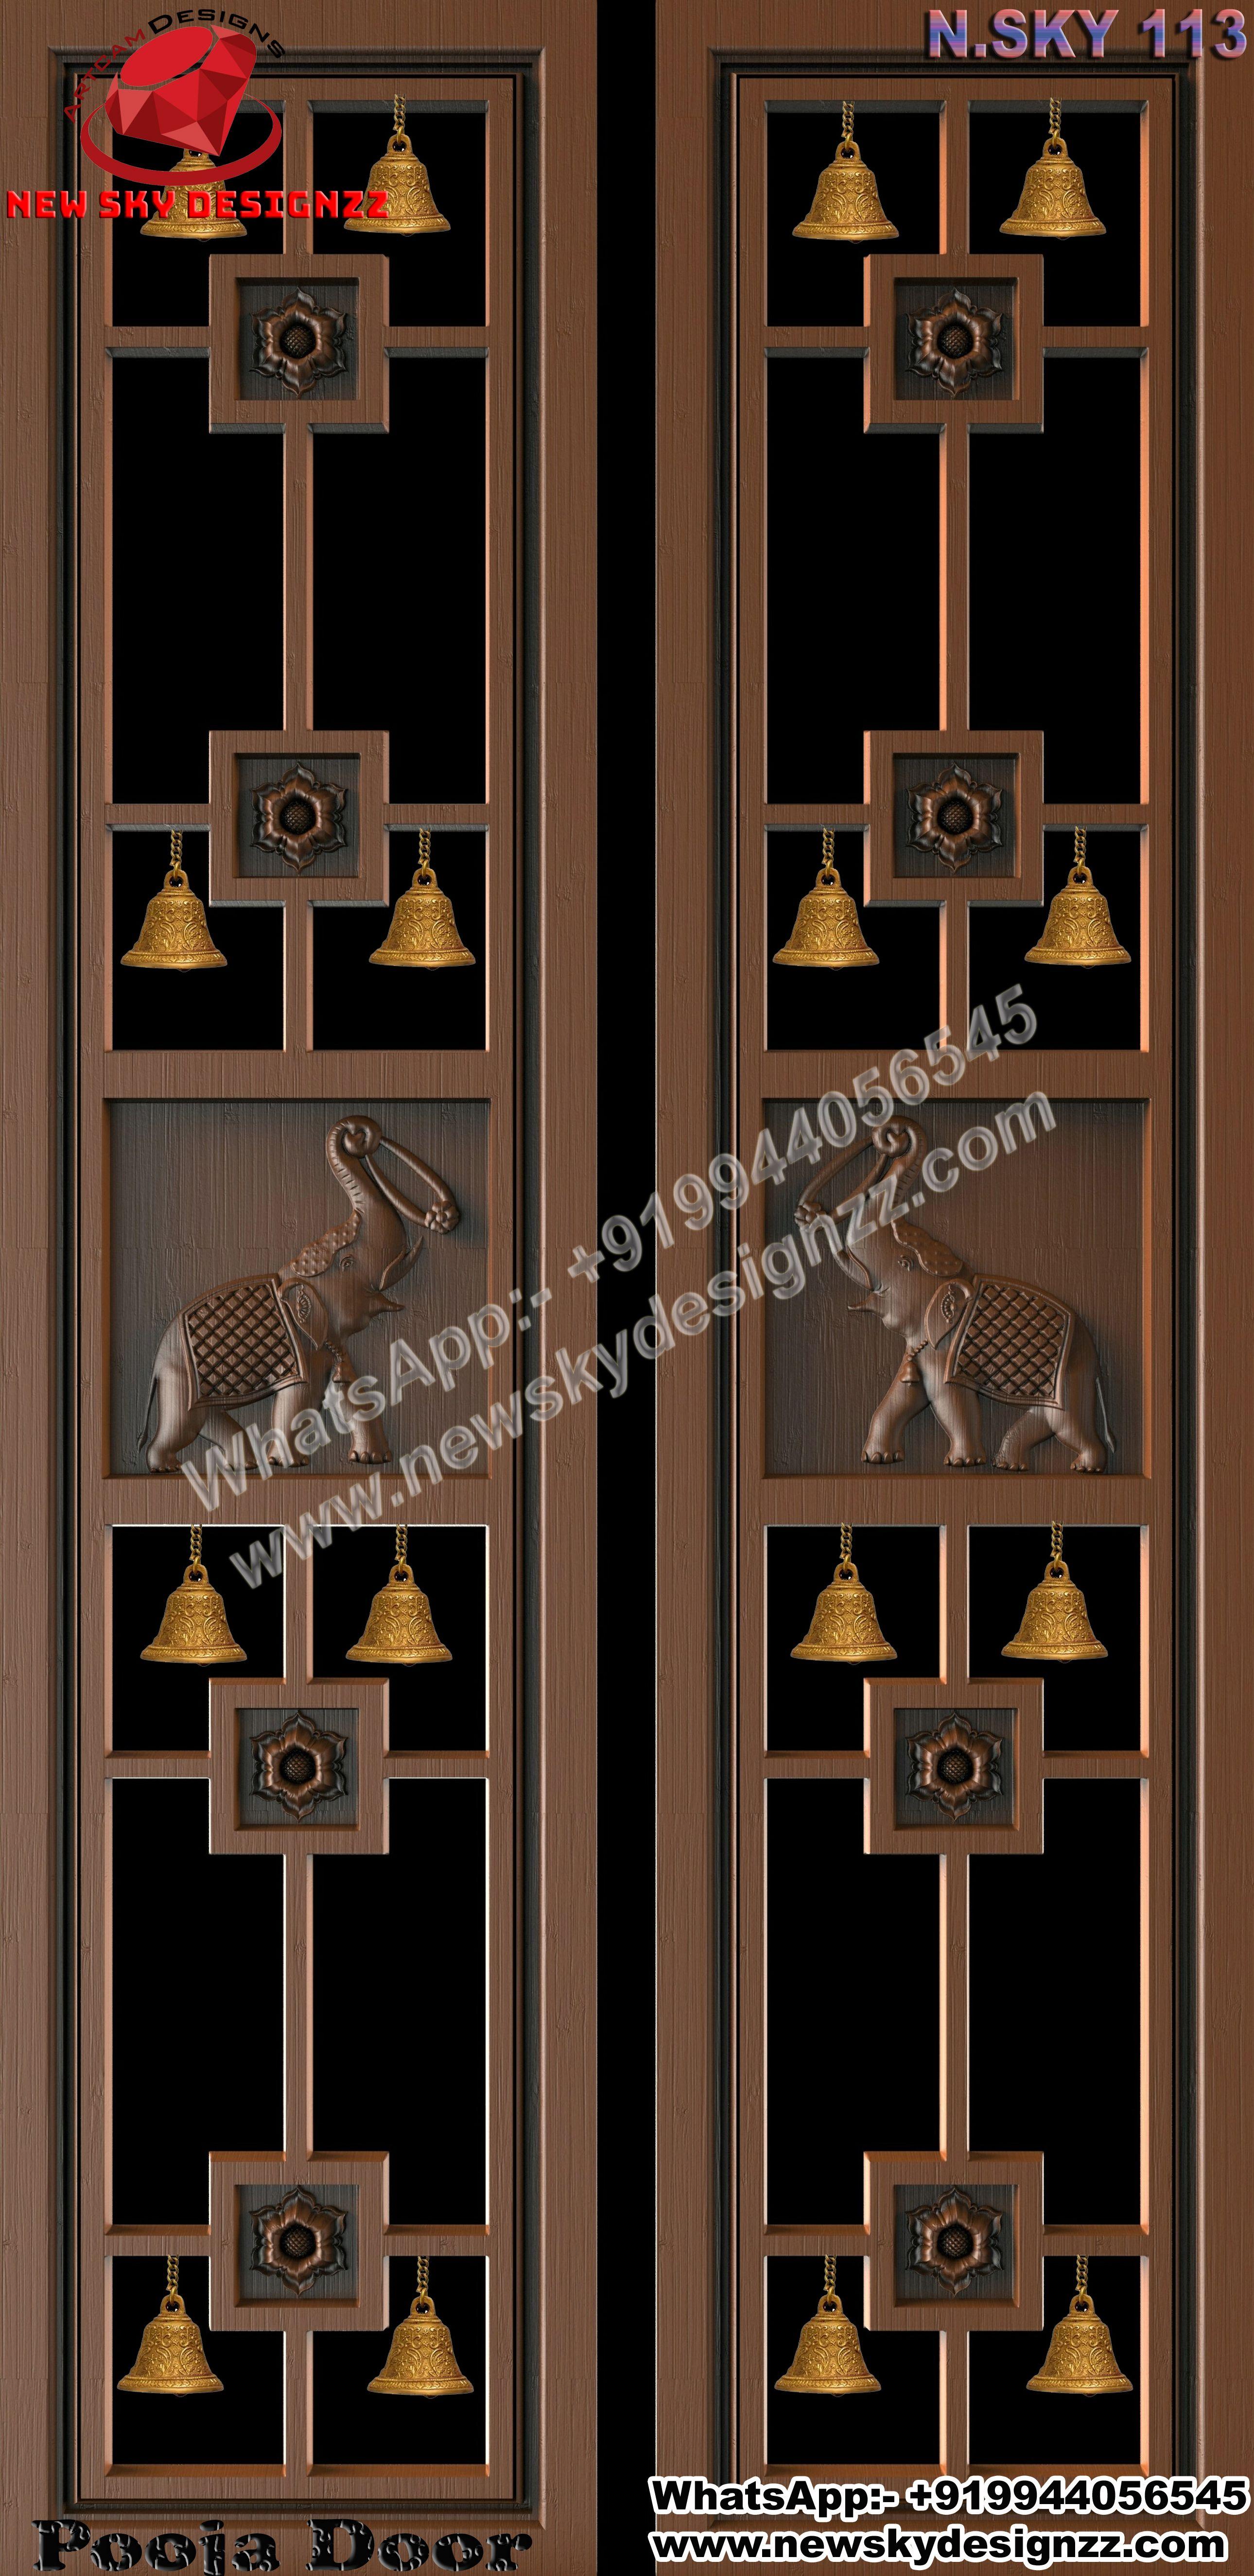 Pin By Pirajikennurkar On Pooja Room Door Designs In 2021 Pooja Room Door Design Room Door Design Wooden Main Door Design Home simple pooja room door designs